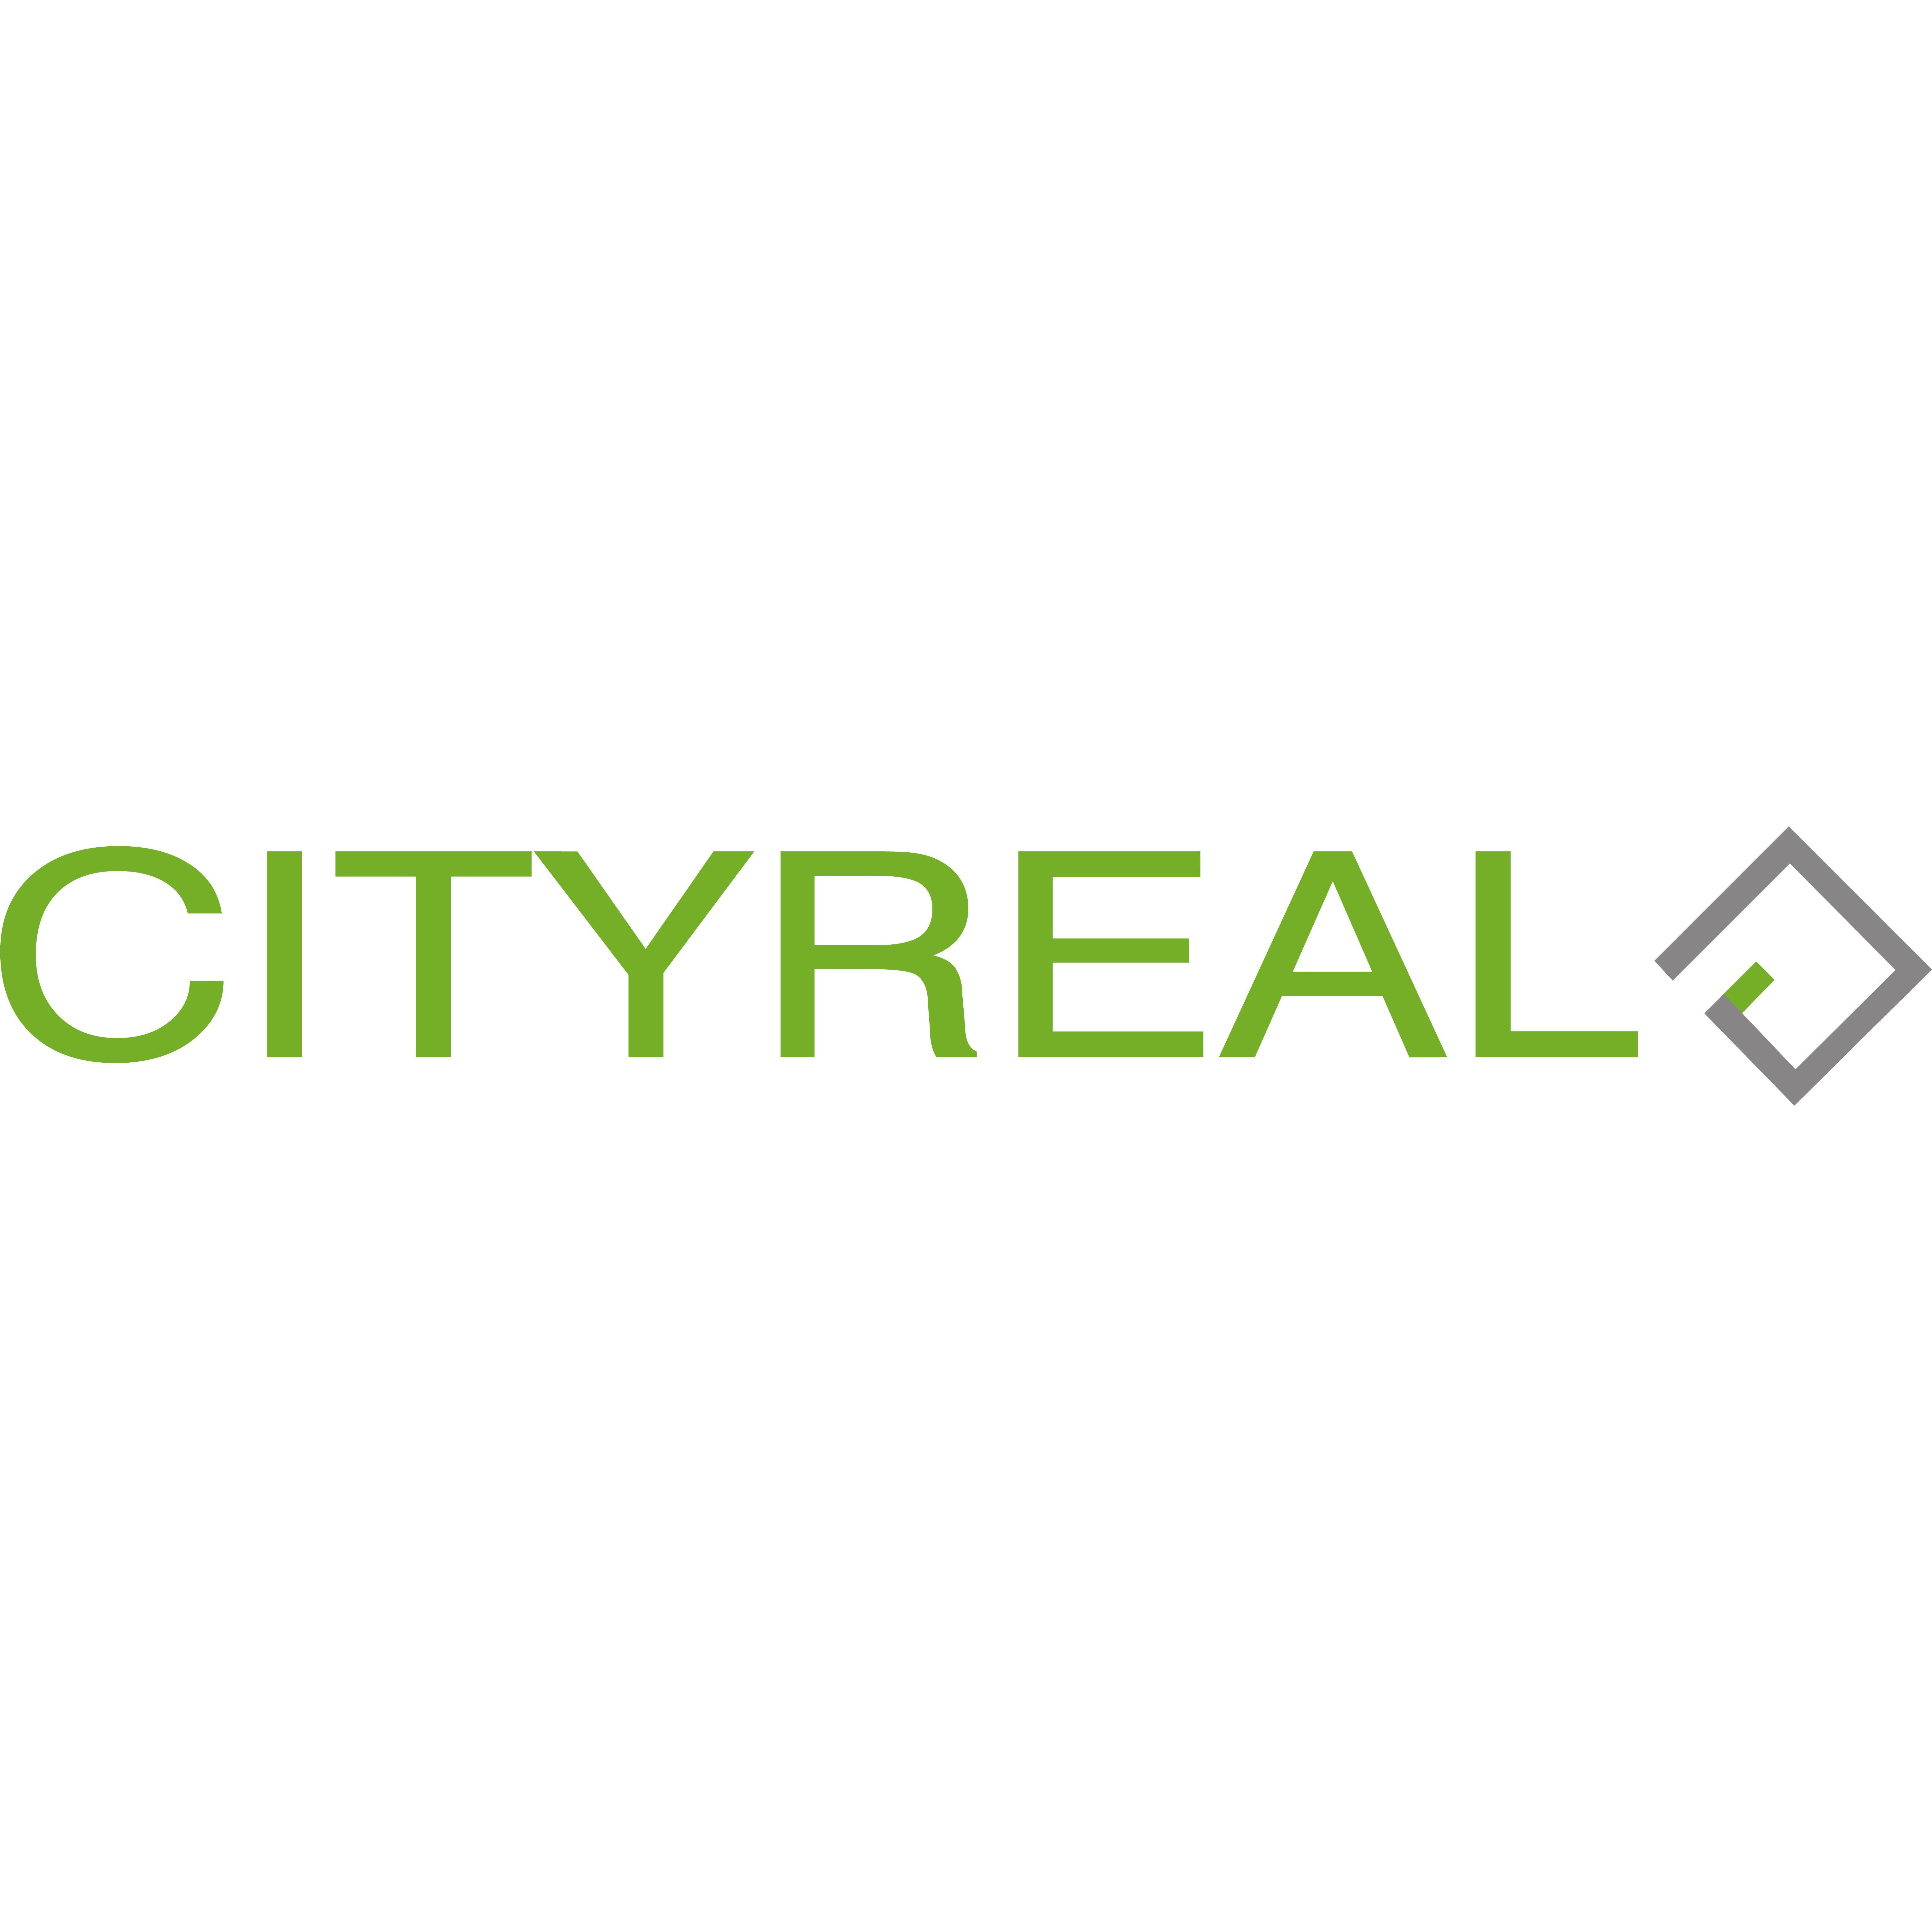 CITYREAL Immobilien Vermittlungs- u VerwaltungsgesmbH